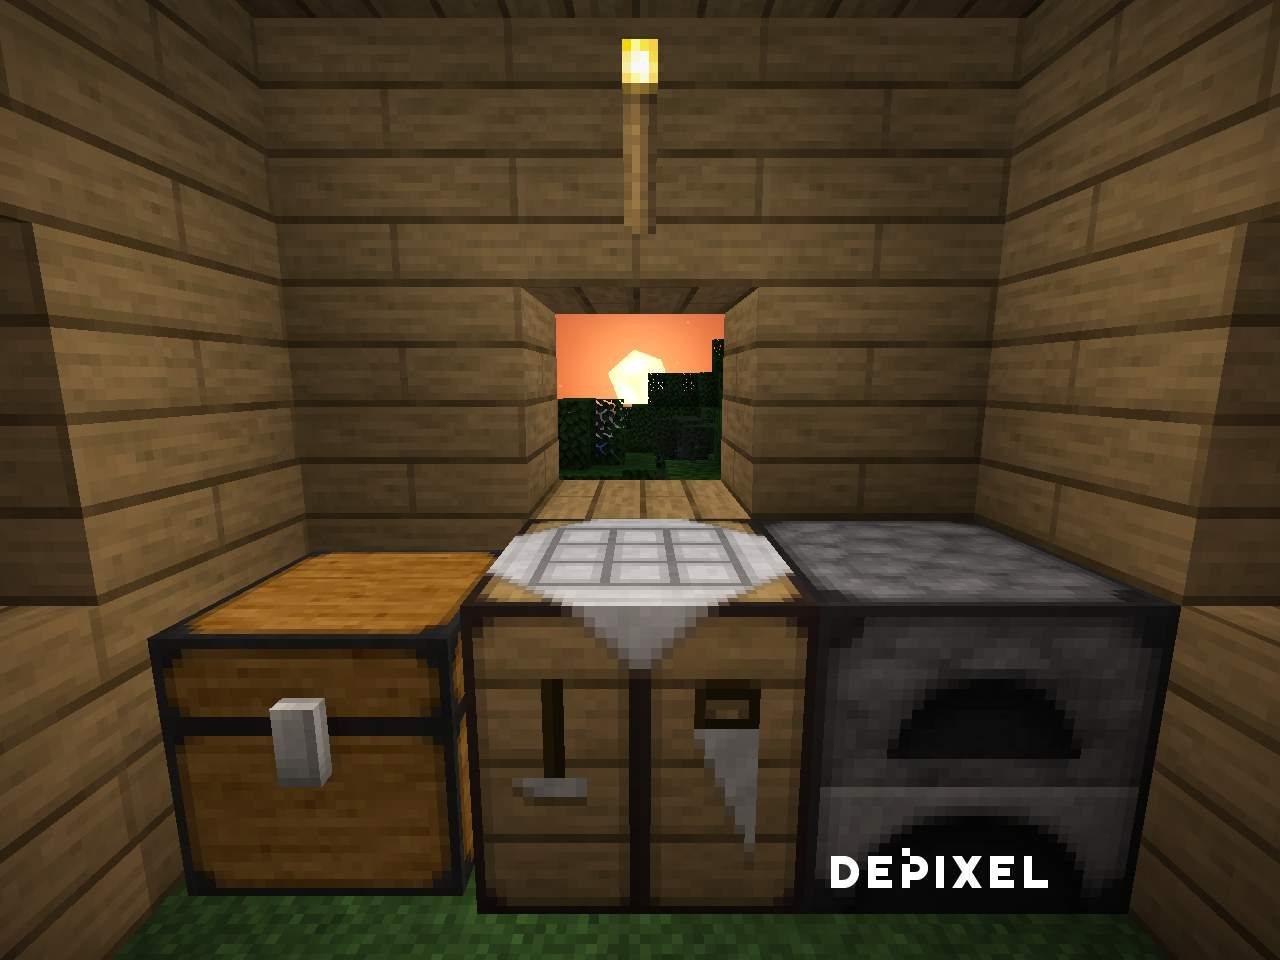 depixel default 32x32 minecraft img2